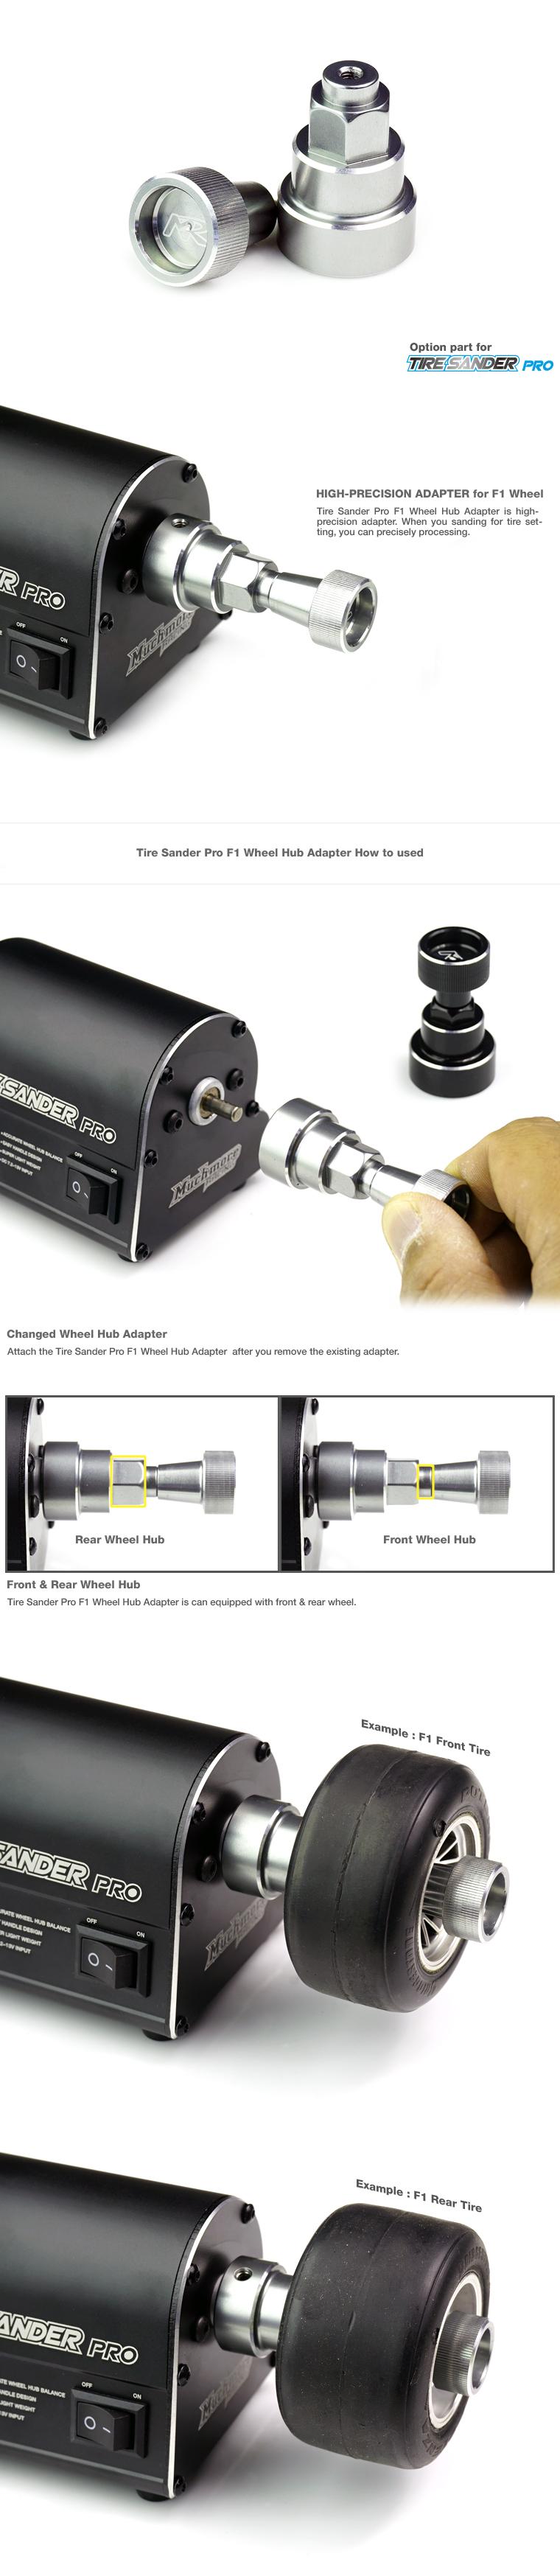 MR-TSPF1Tire Sander Pro F1 Wheel Hub Adapter By Muchmore Racing Co., Ltd.